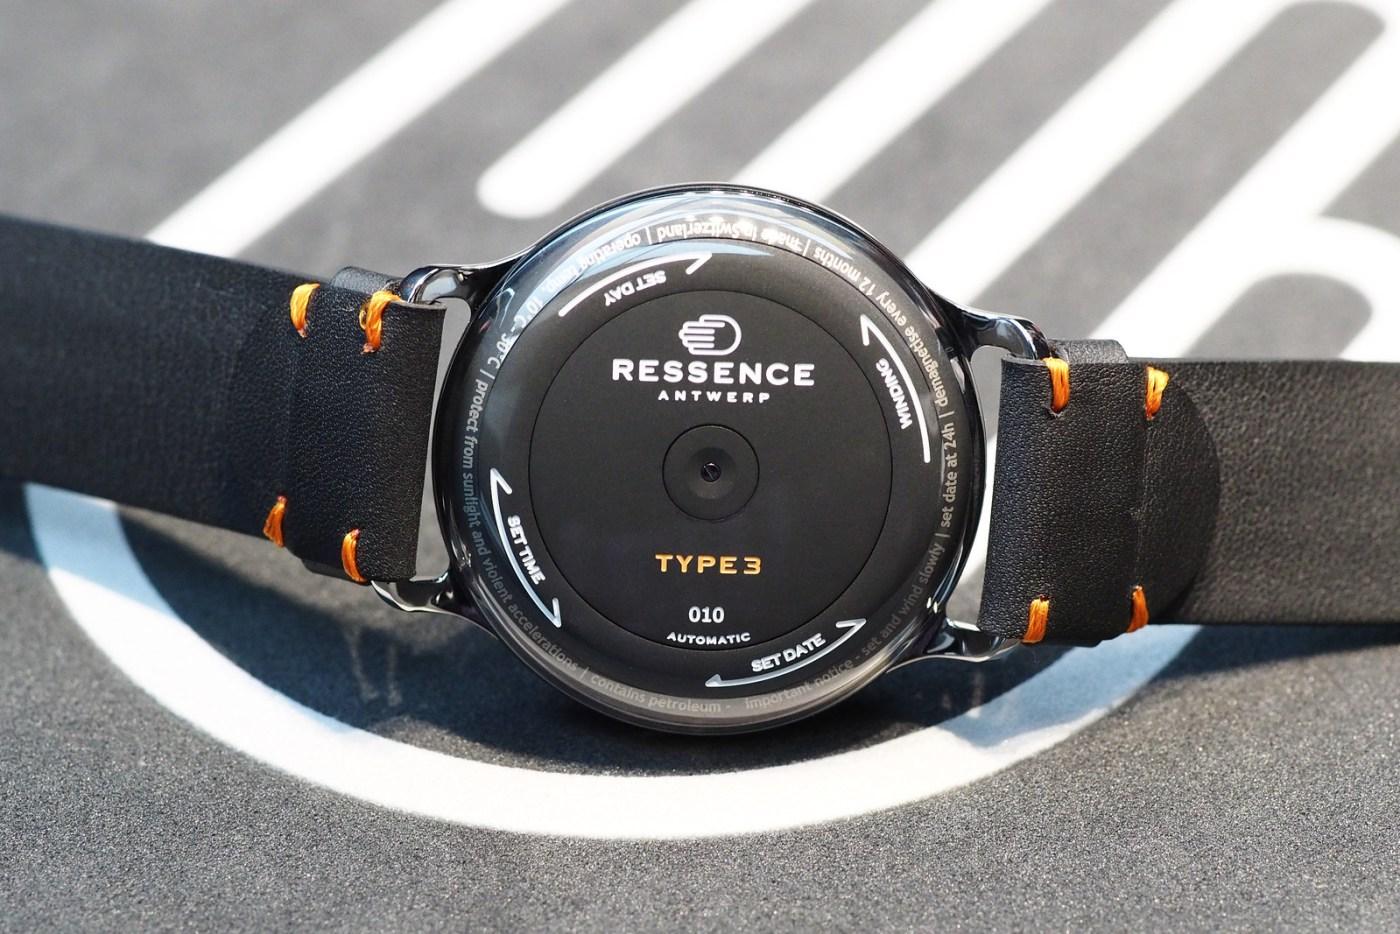 Ressence Type 3